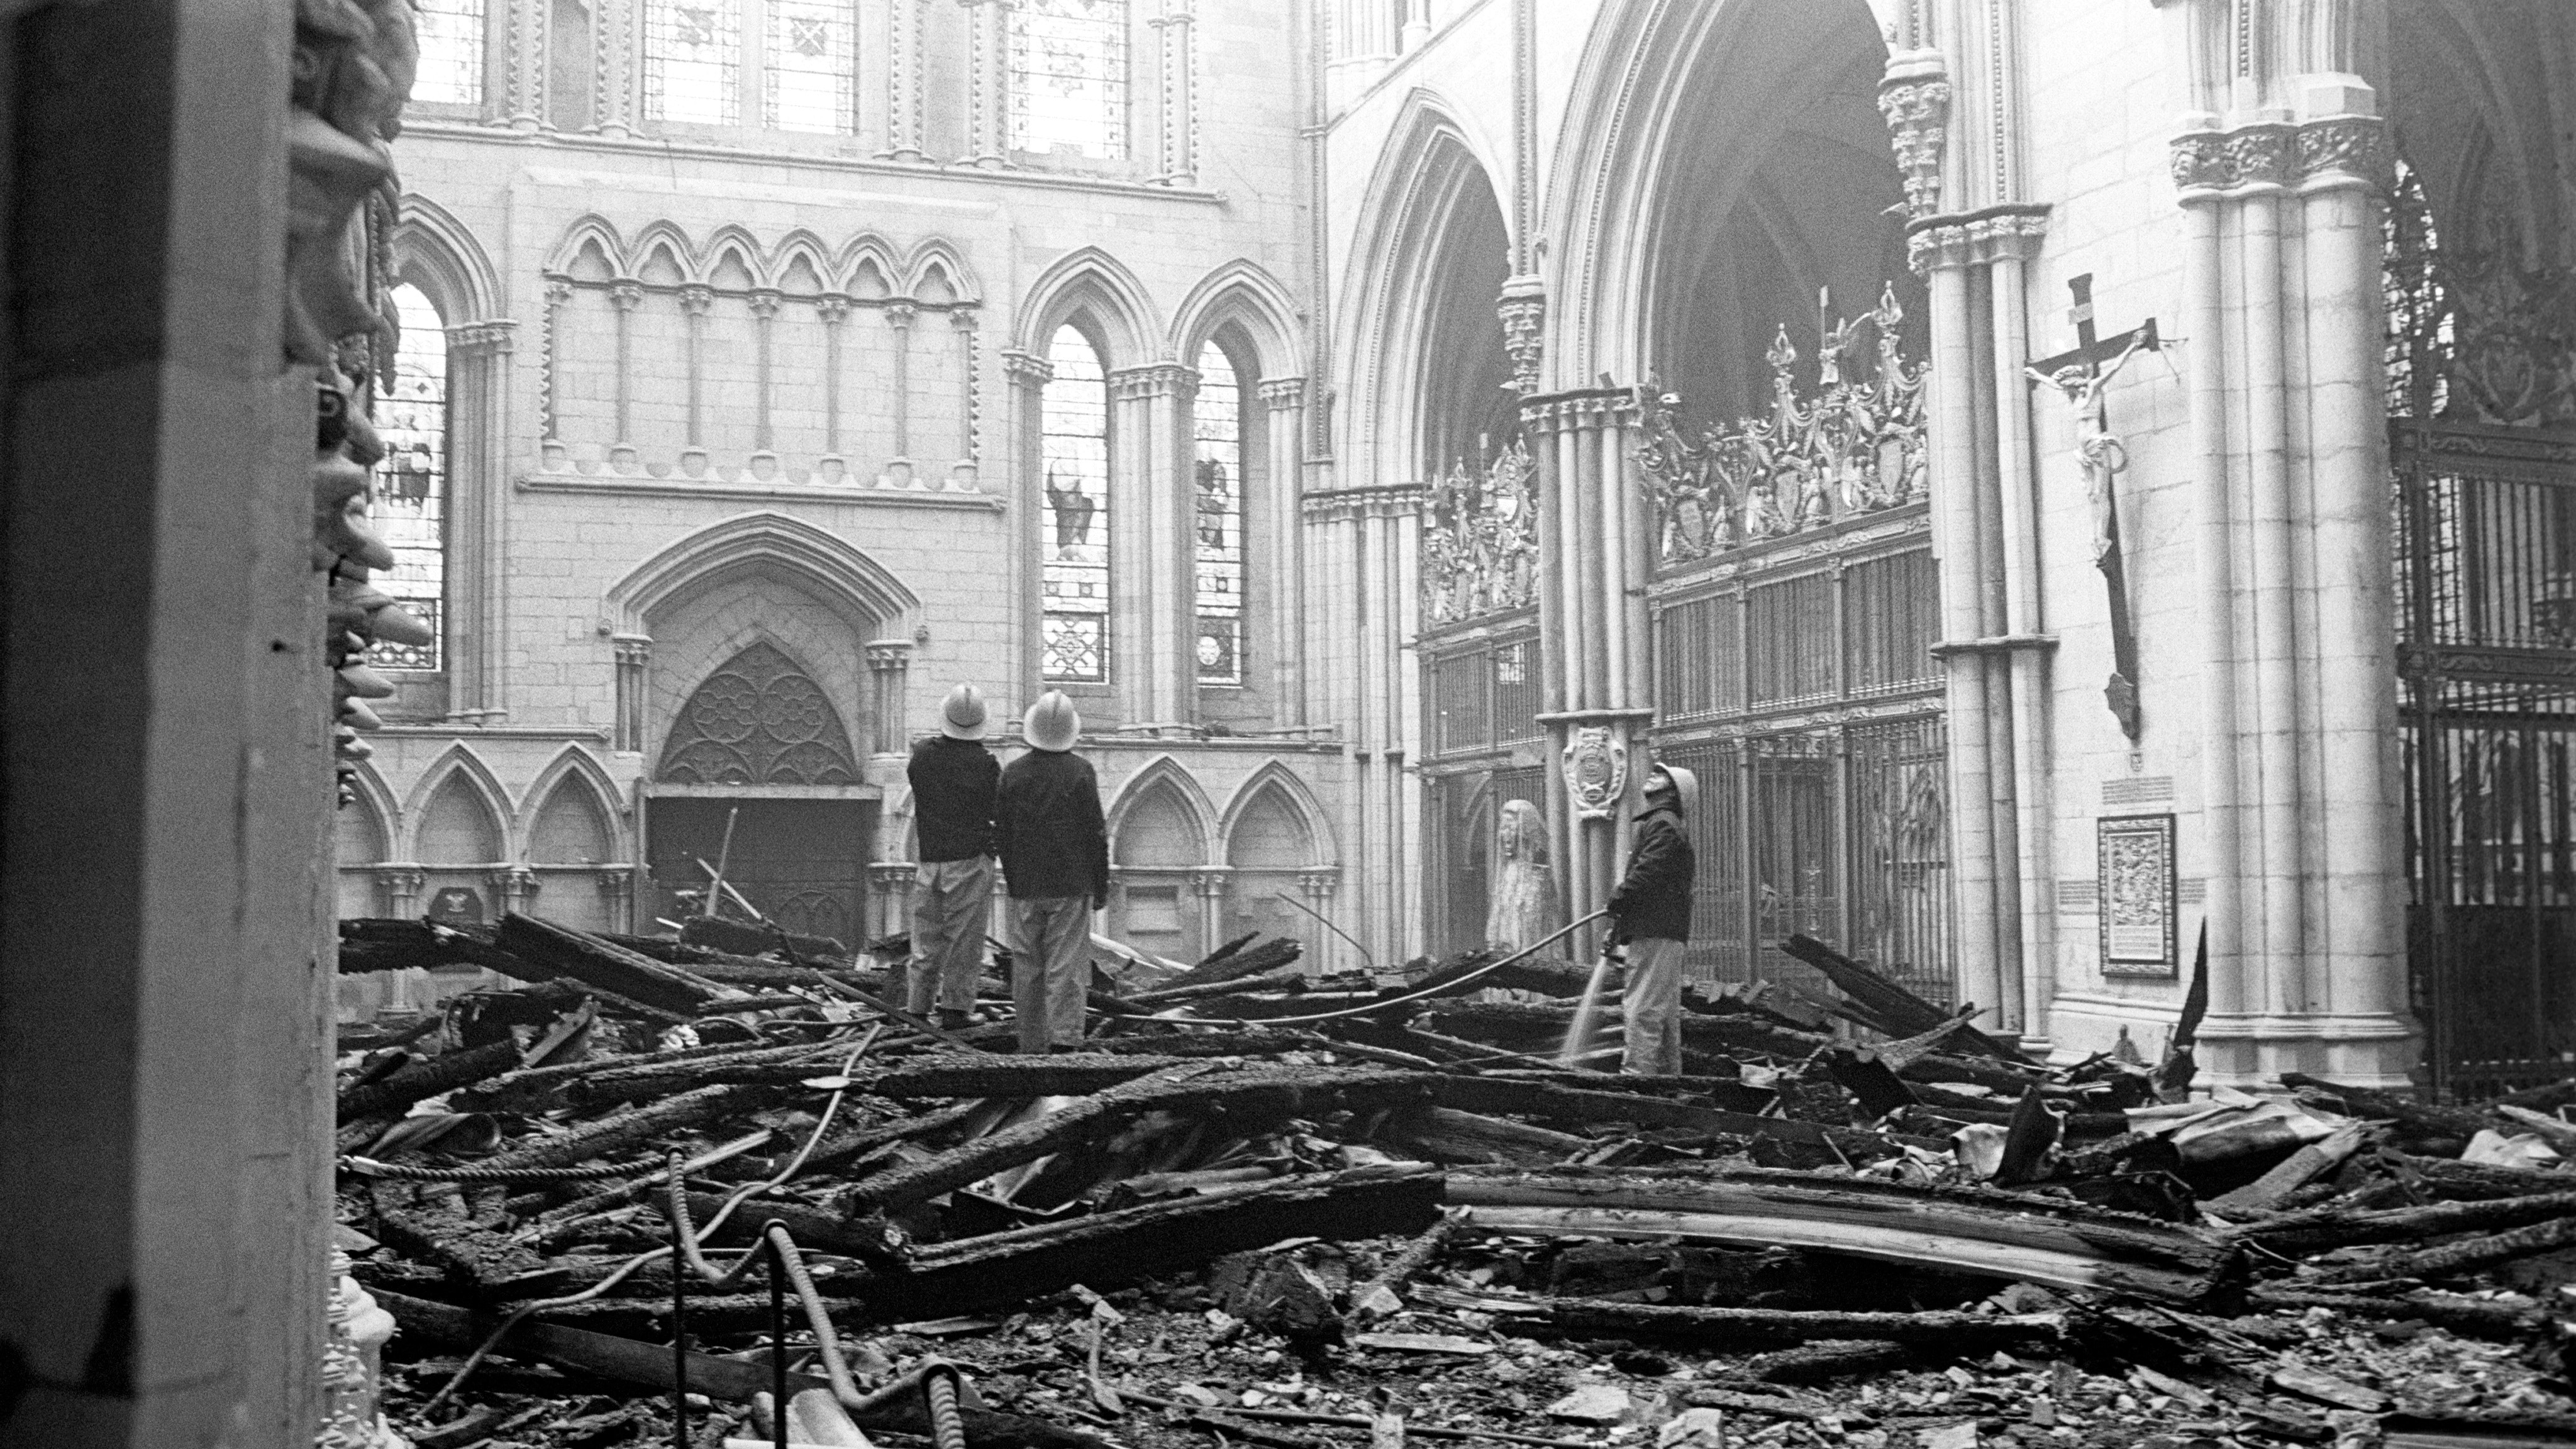 notre dame tragedy stirs memories of 1984 york minster